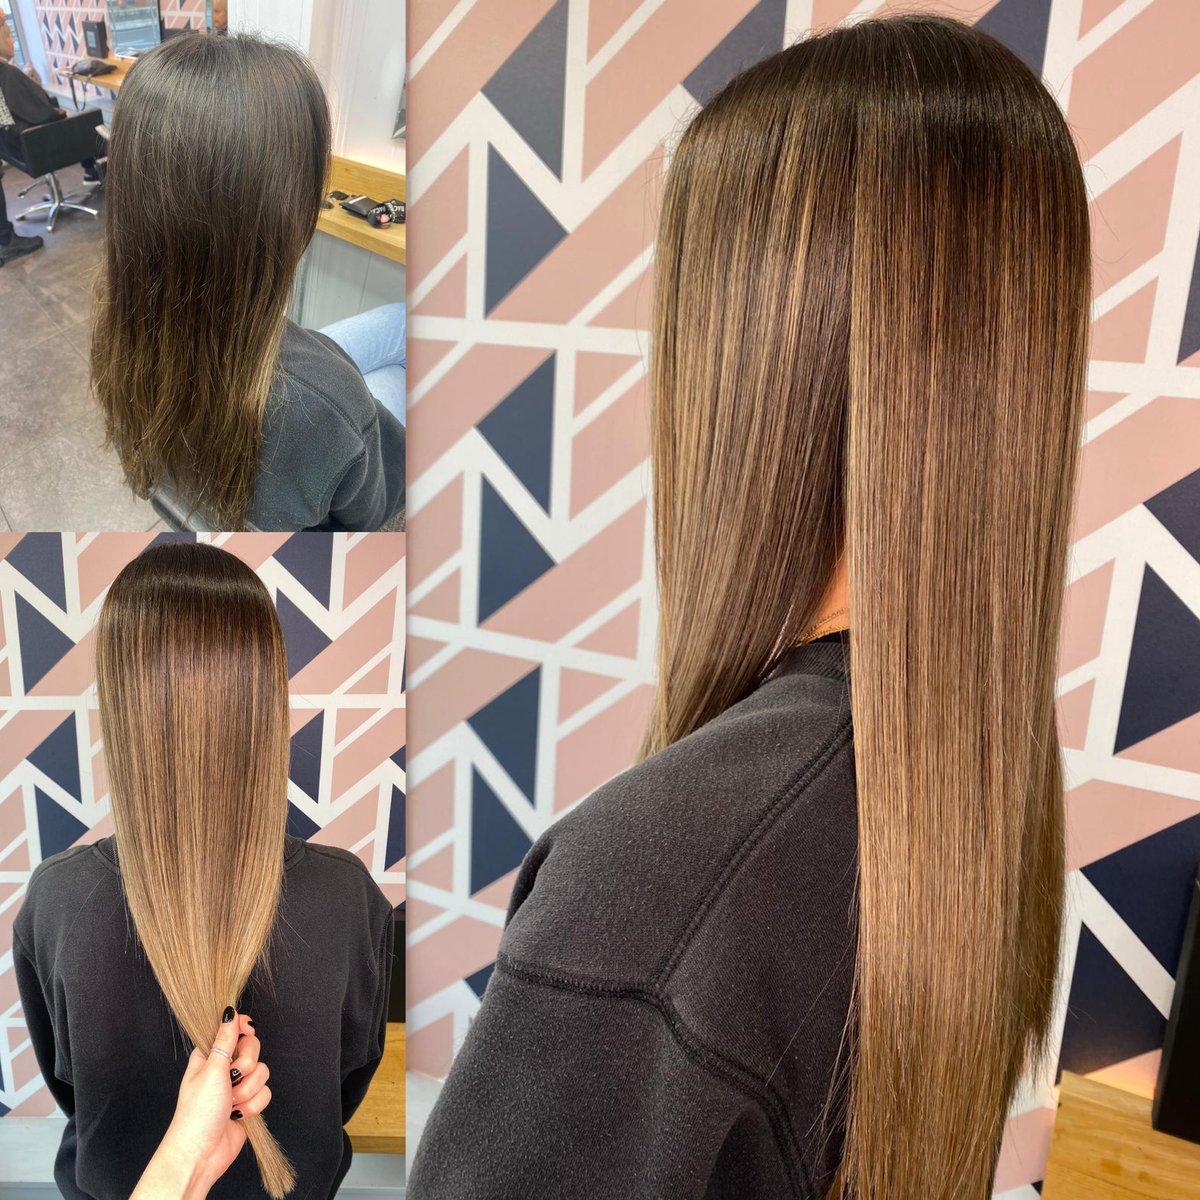 We've got mega hair envy! Great transformation by Daisy #balayage #truro #cornwall #marzipanhair #redken #hairtransformation @redkenukpic.twitter.com/sO2oreK57G